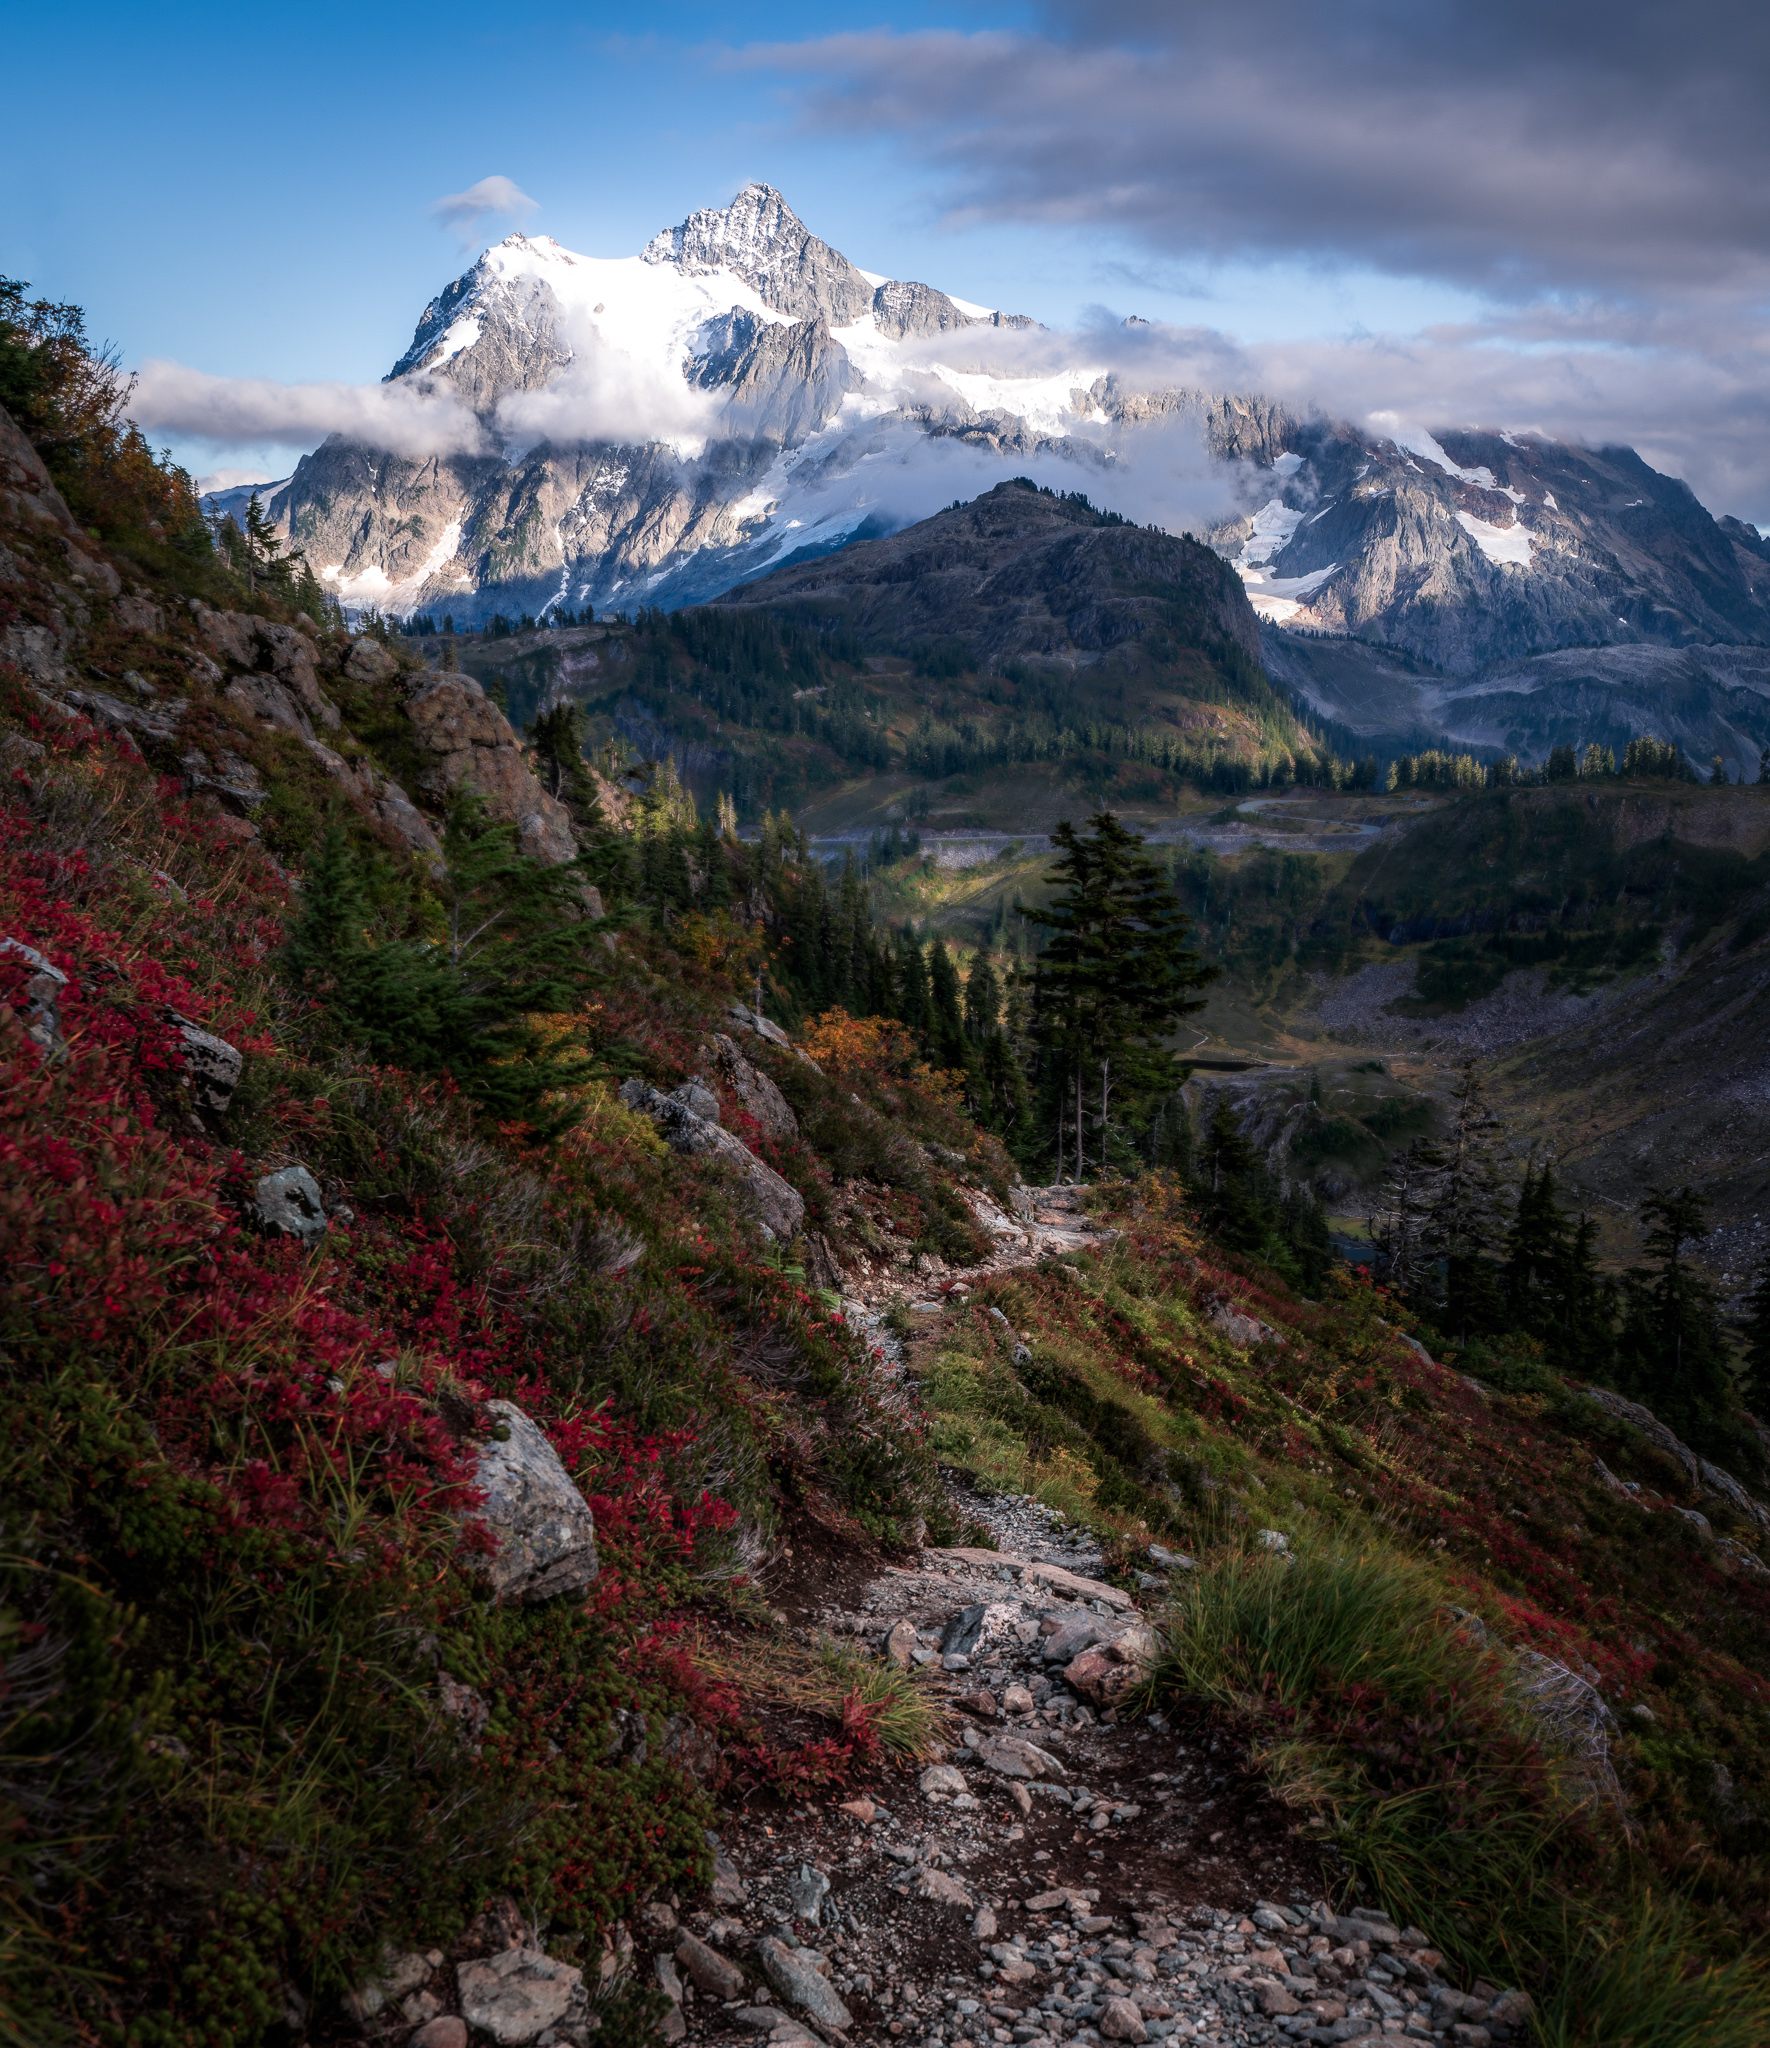 Fall and Mt. Shuksan